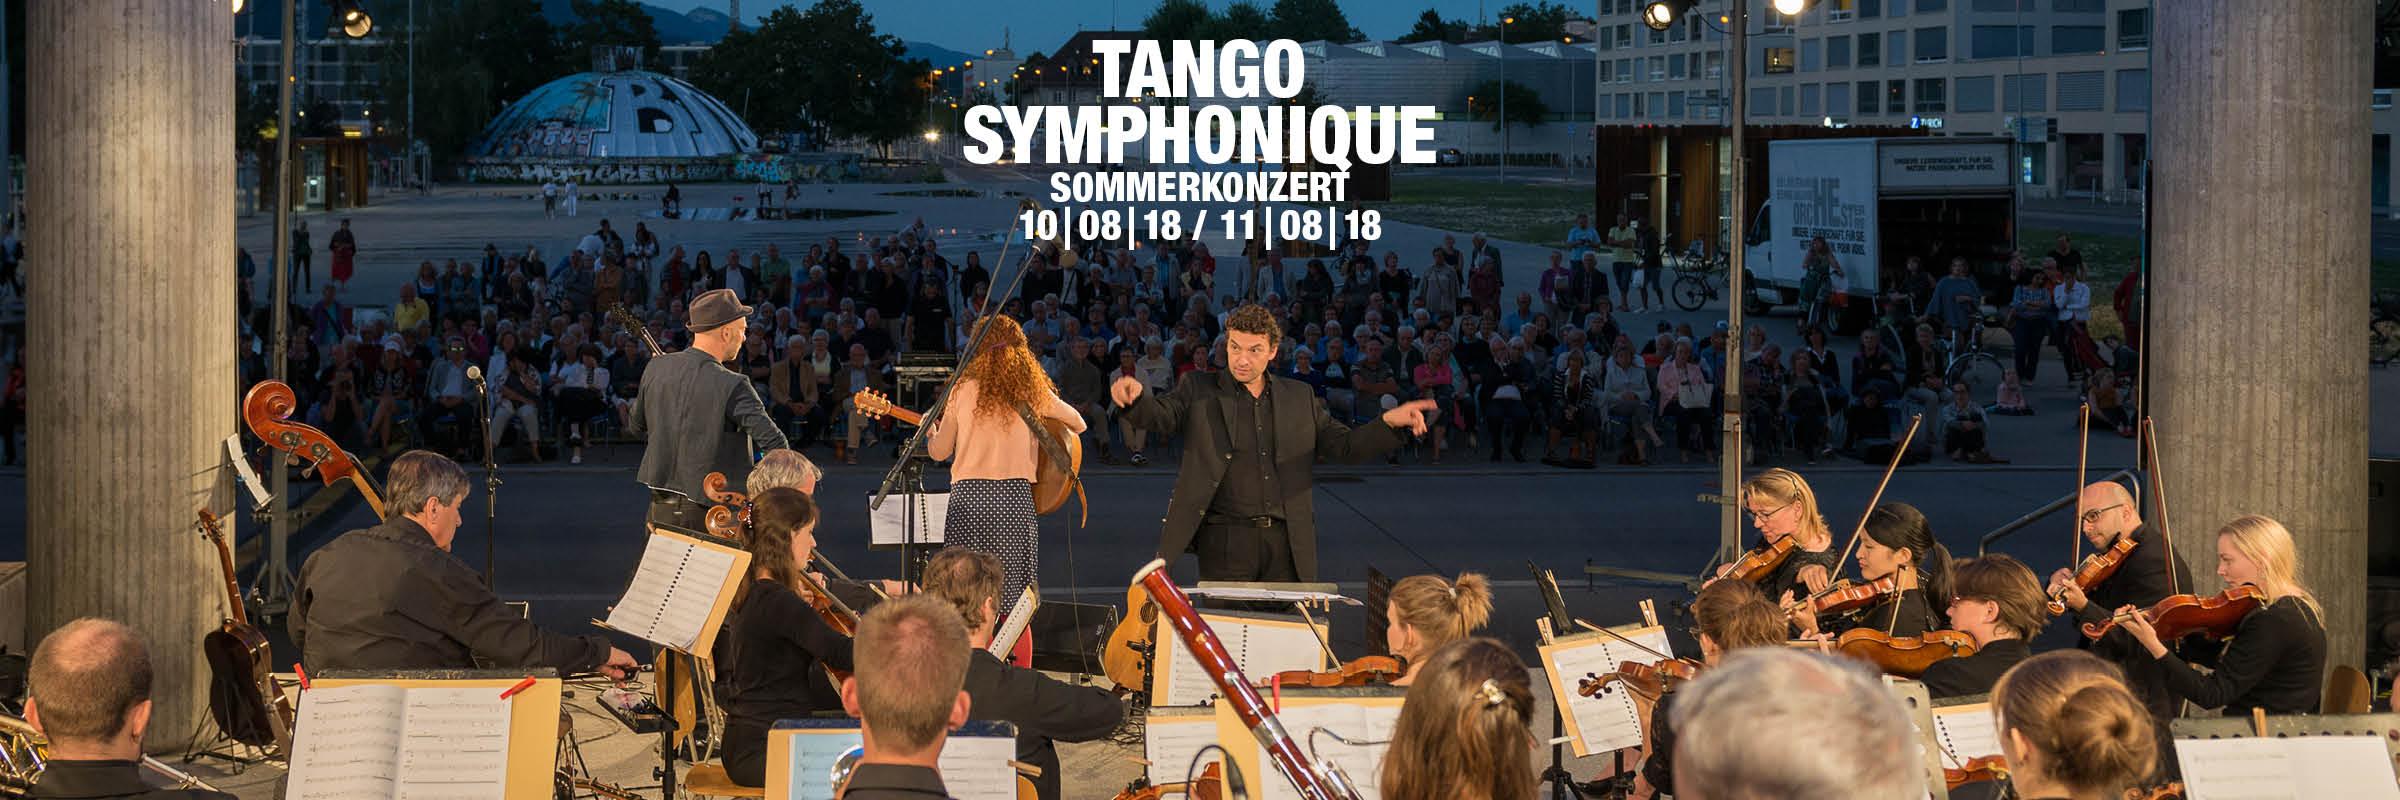 Tango Symphonique